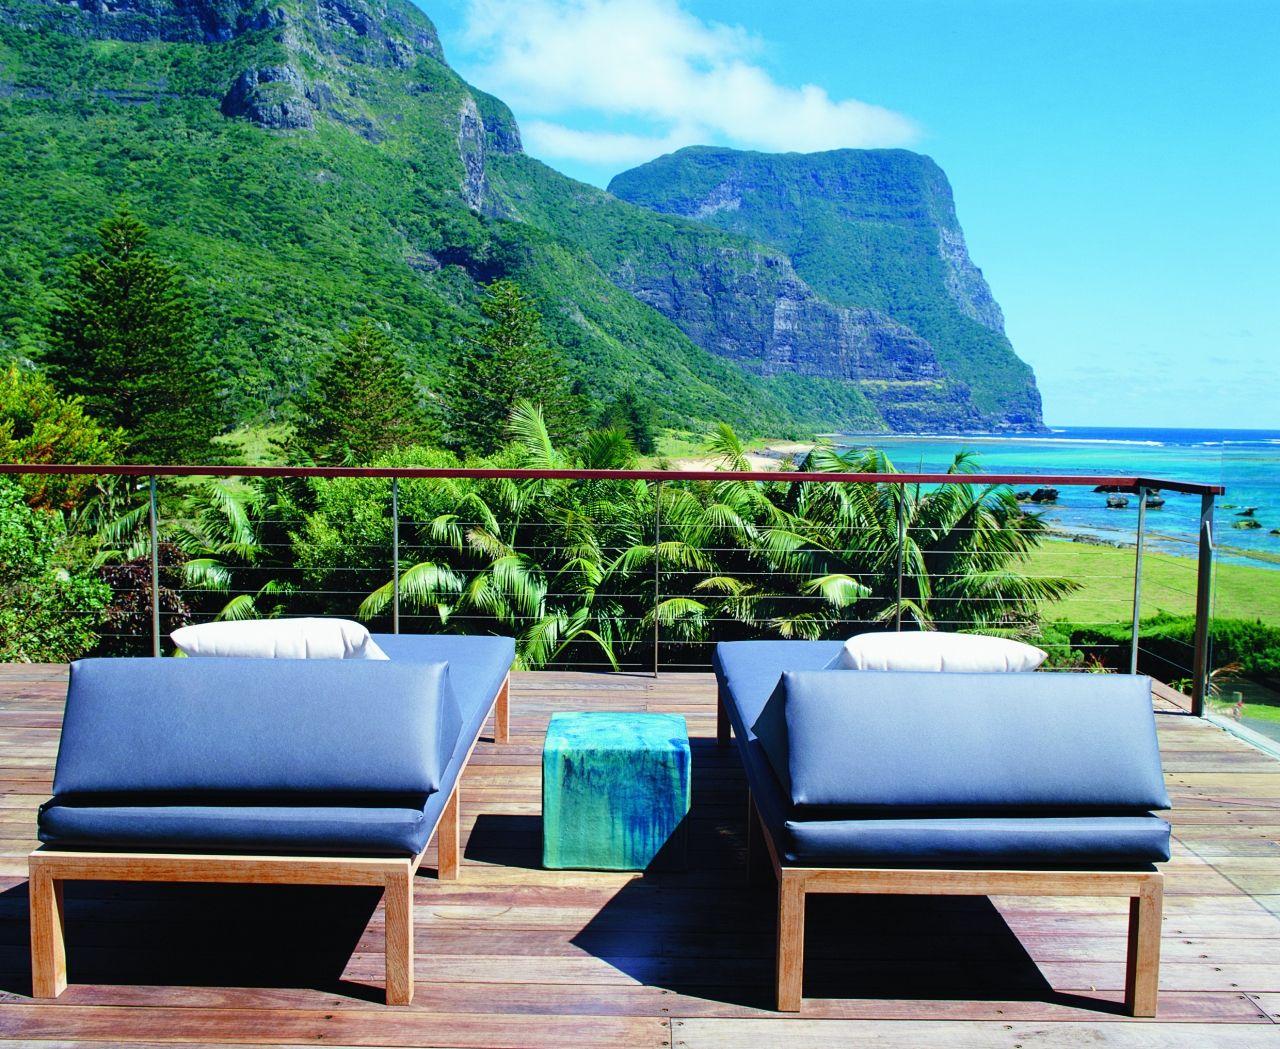 Lord Howe Island, Australia | Australia | Capella lodge ...